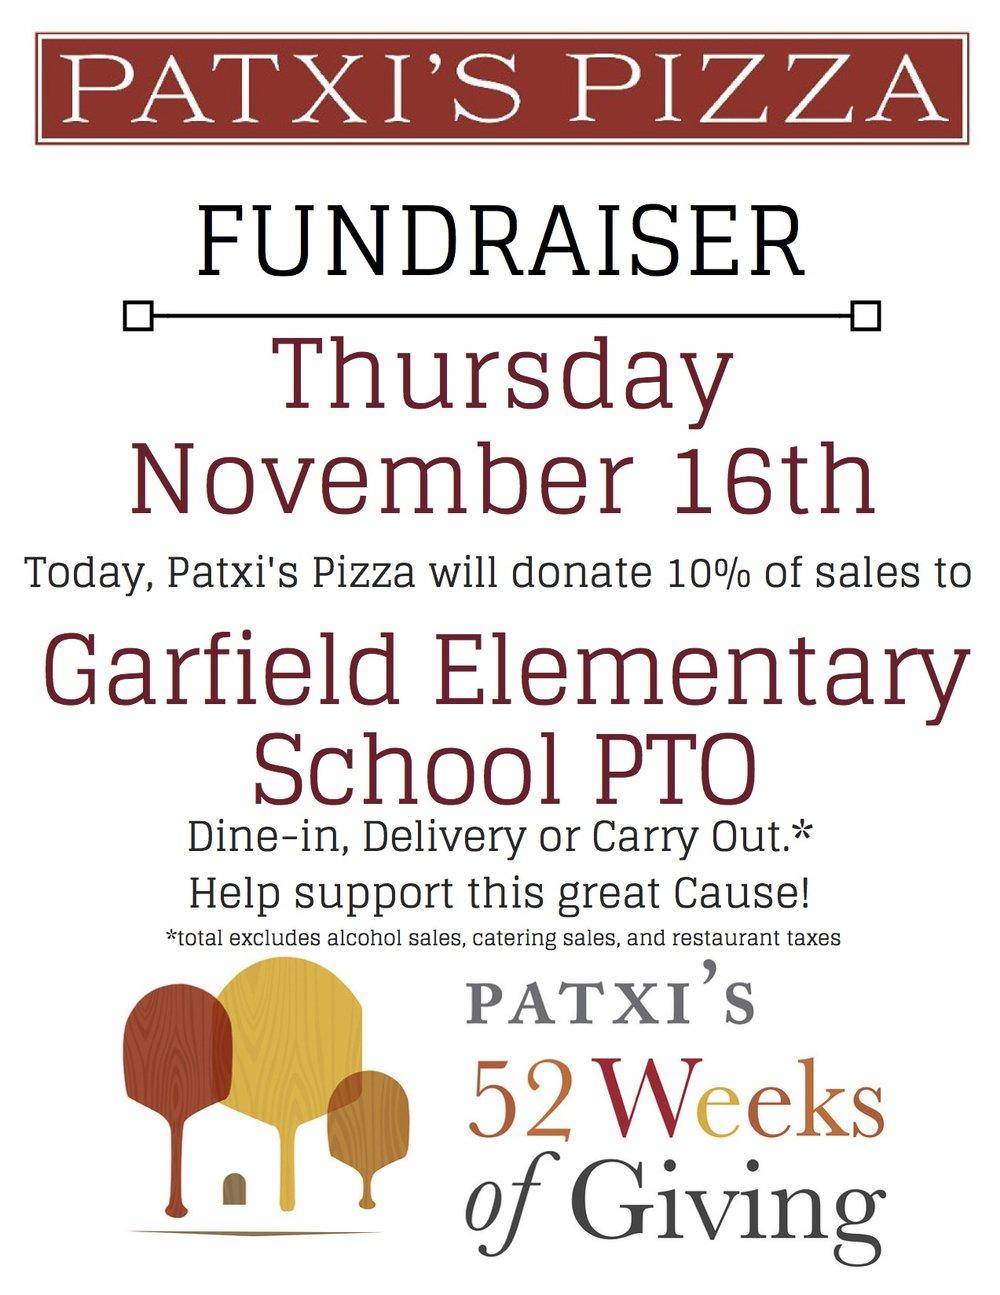 Garfield Elementary School PTO 11.16 flyer.jpg